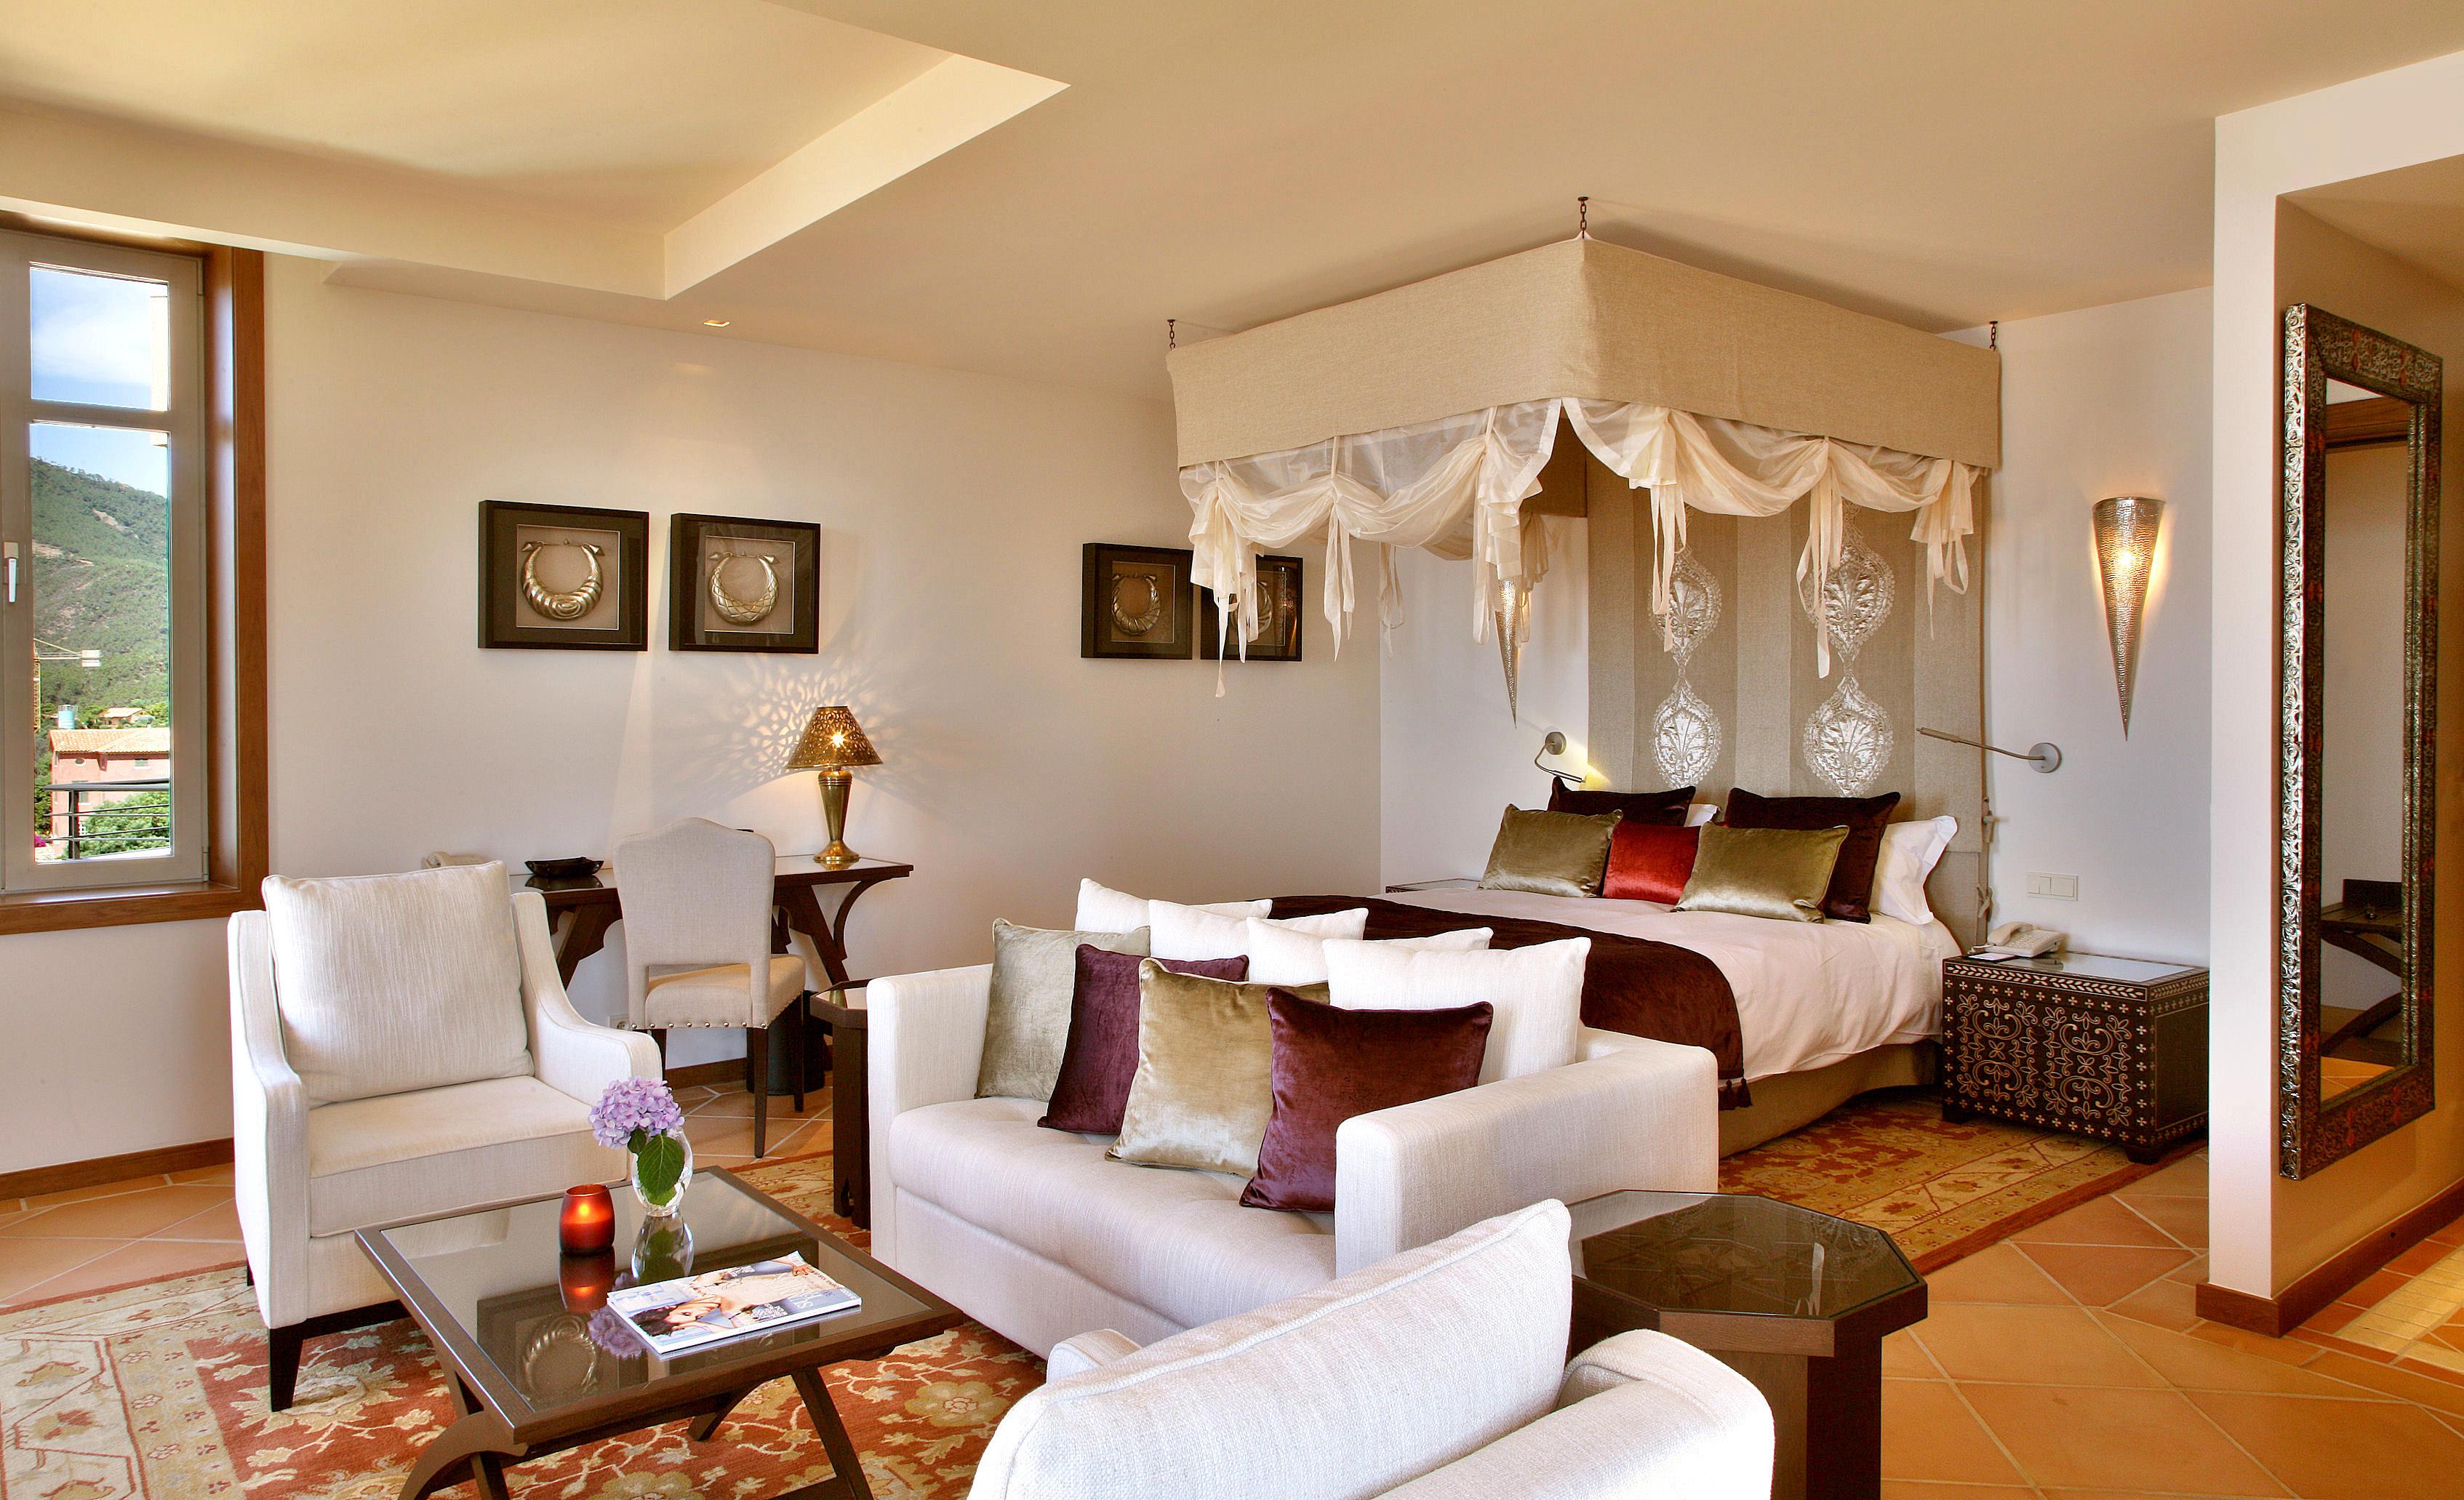 Bedroom Elegant Historic Luxury Suite sofa property living room home Villa cottage condominium nice flat